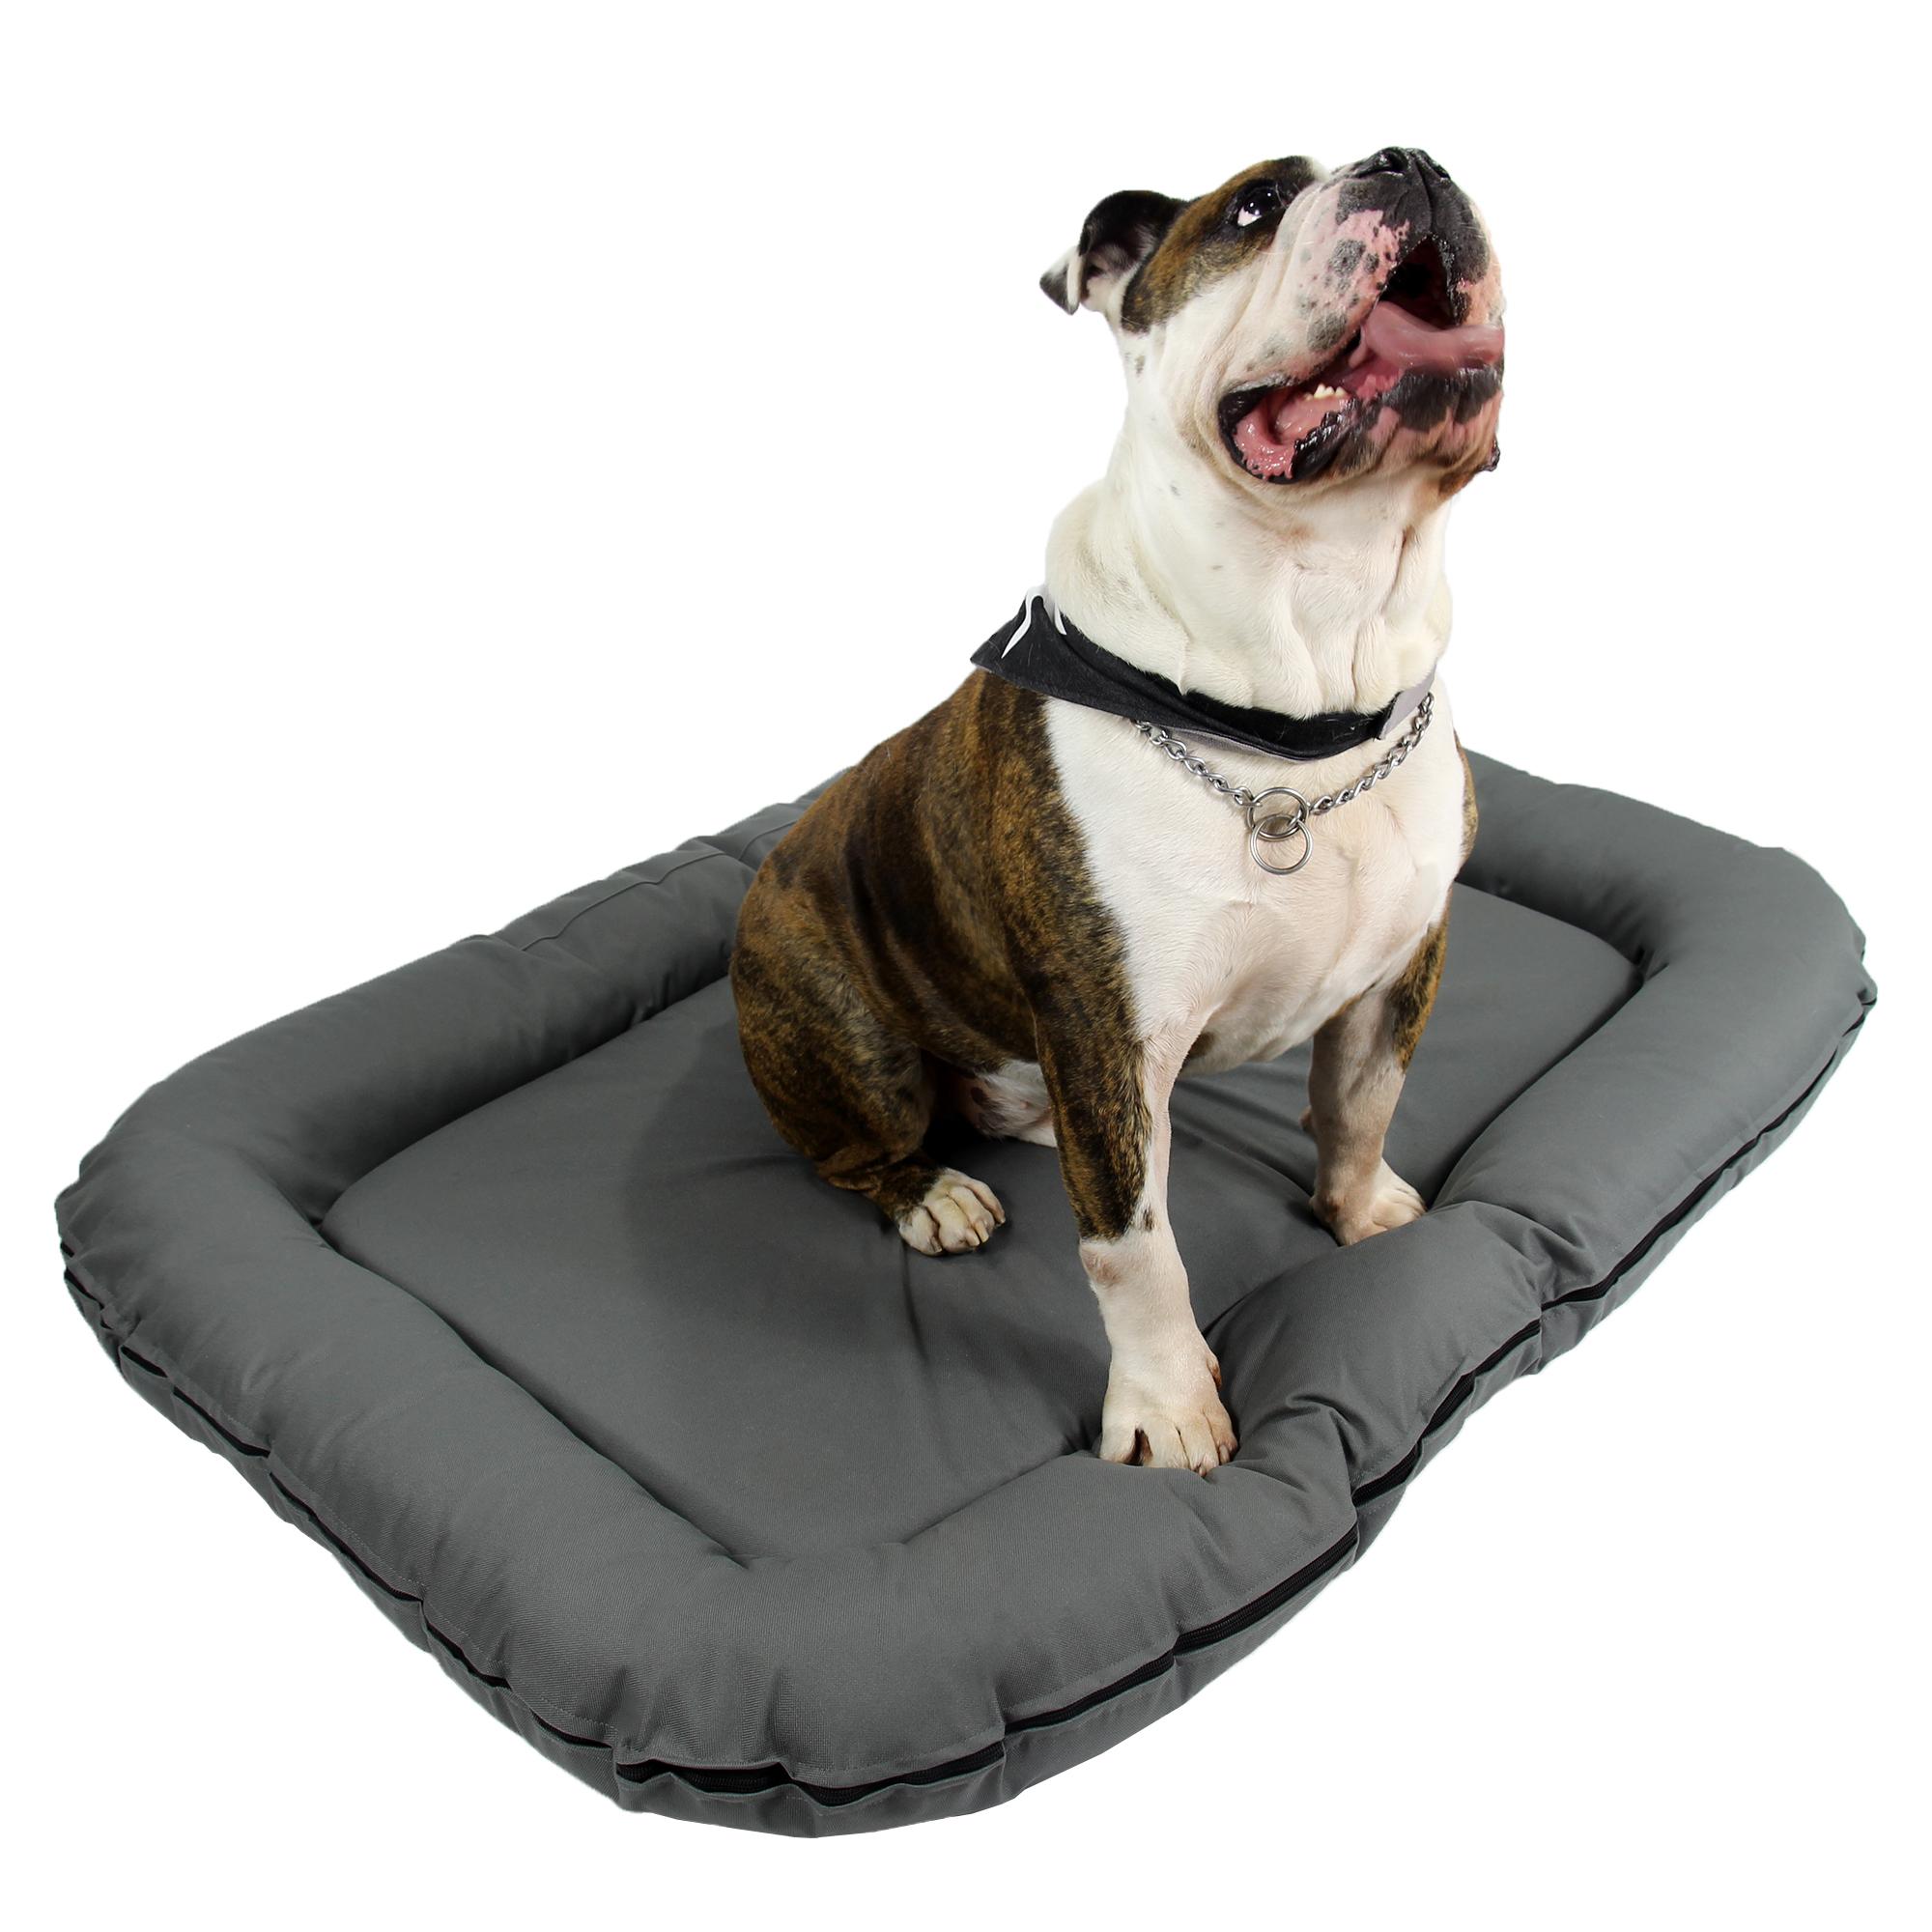 wasserfestes hundebett hundekorb orthop dische tierbett. Black Bedroom Furniture Sets. Home Design Ideas